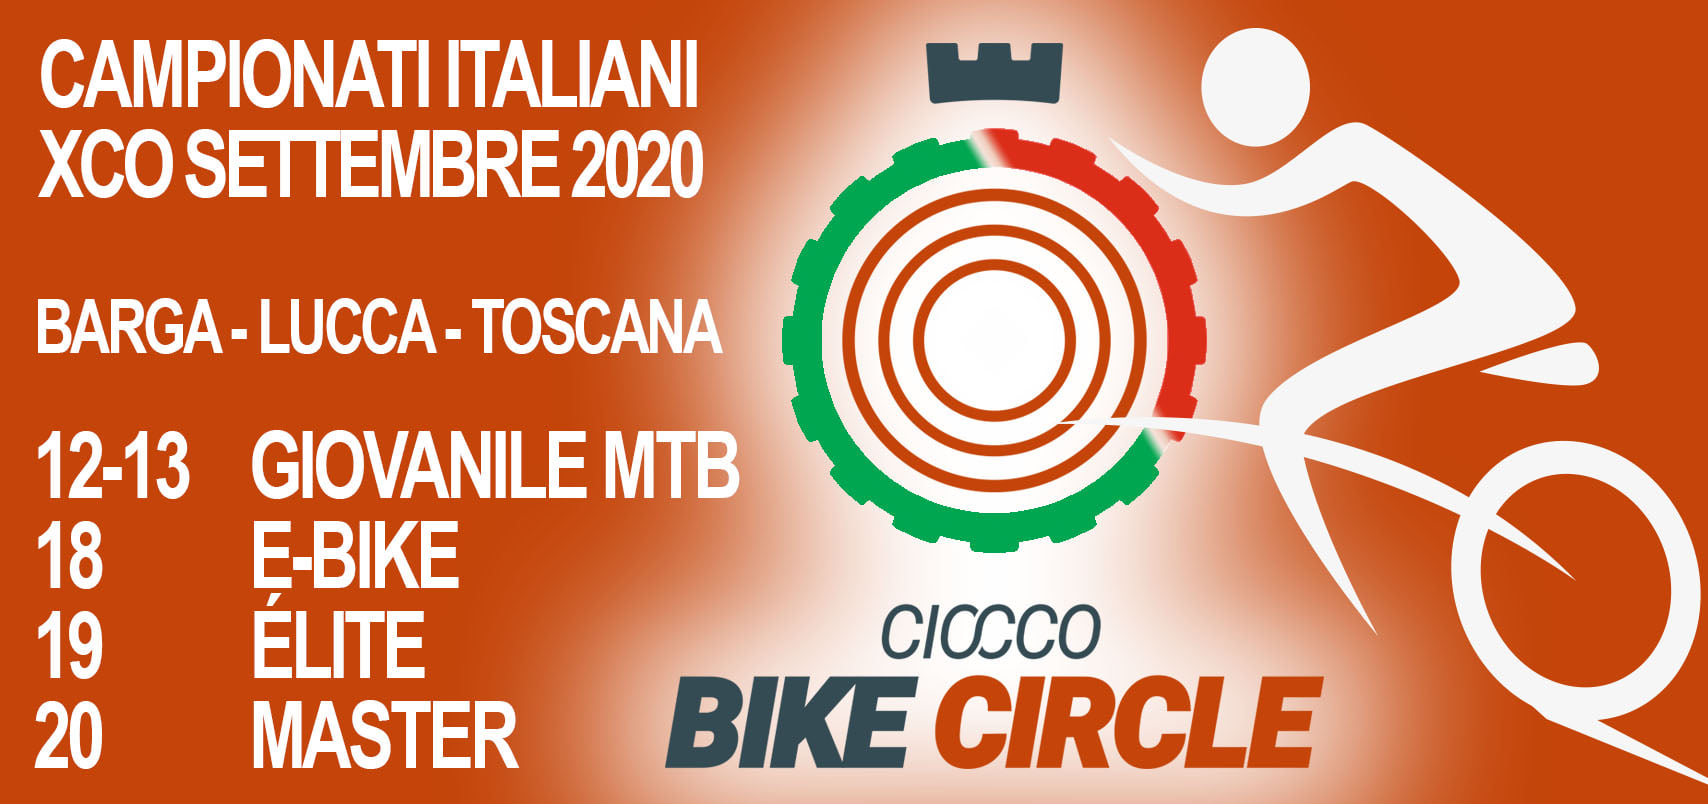 Campionati Italiani Xc 2020